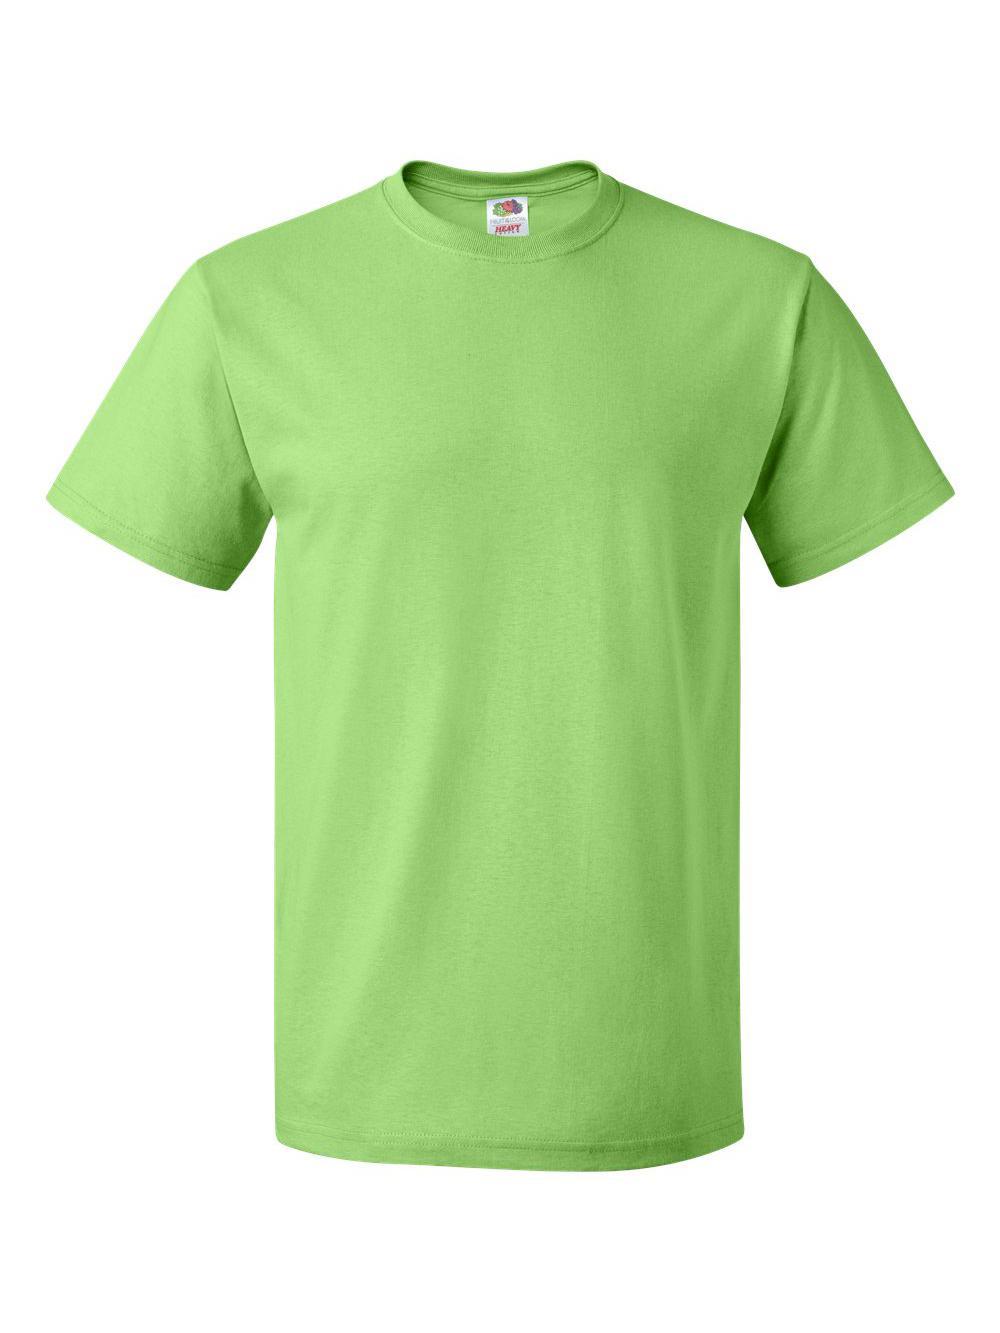 Fruit-of-the-Loom-HD-Cotton-Short-Sleeve-T-Shirt-3930R thumbnail 69